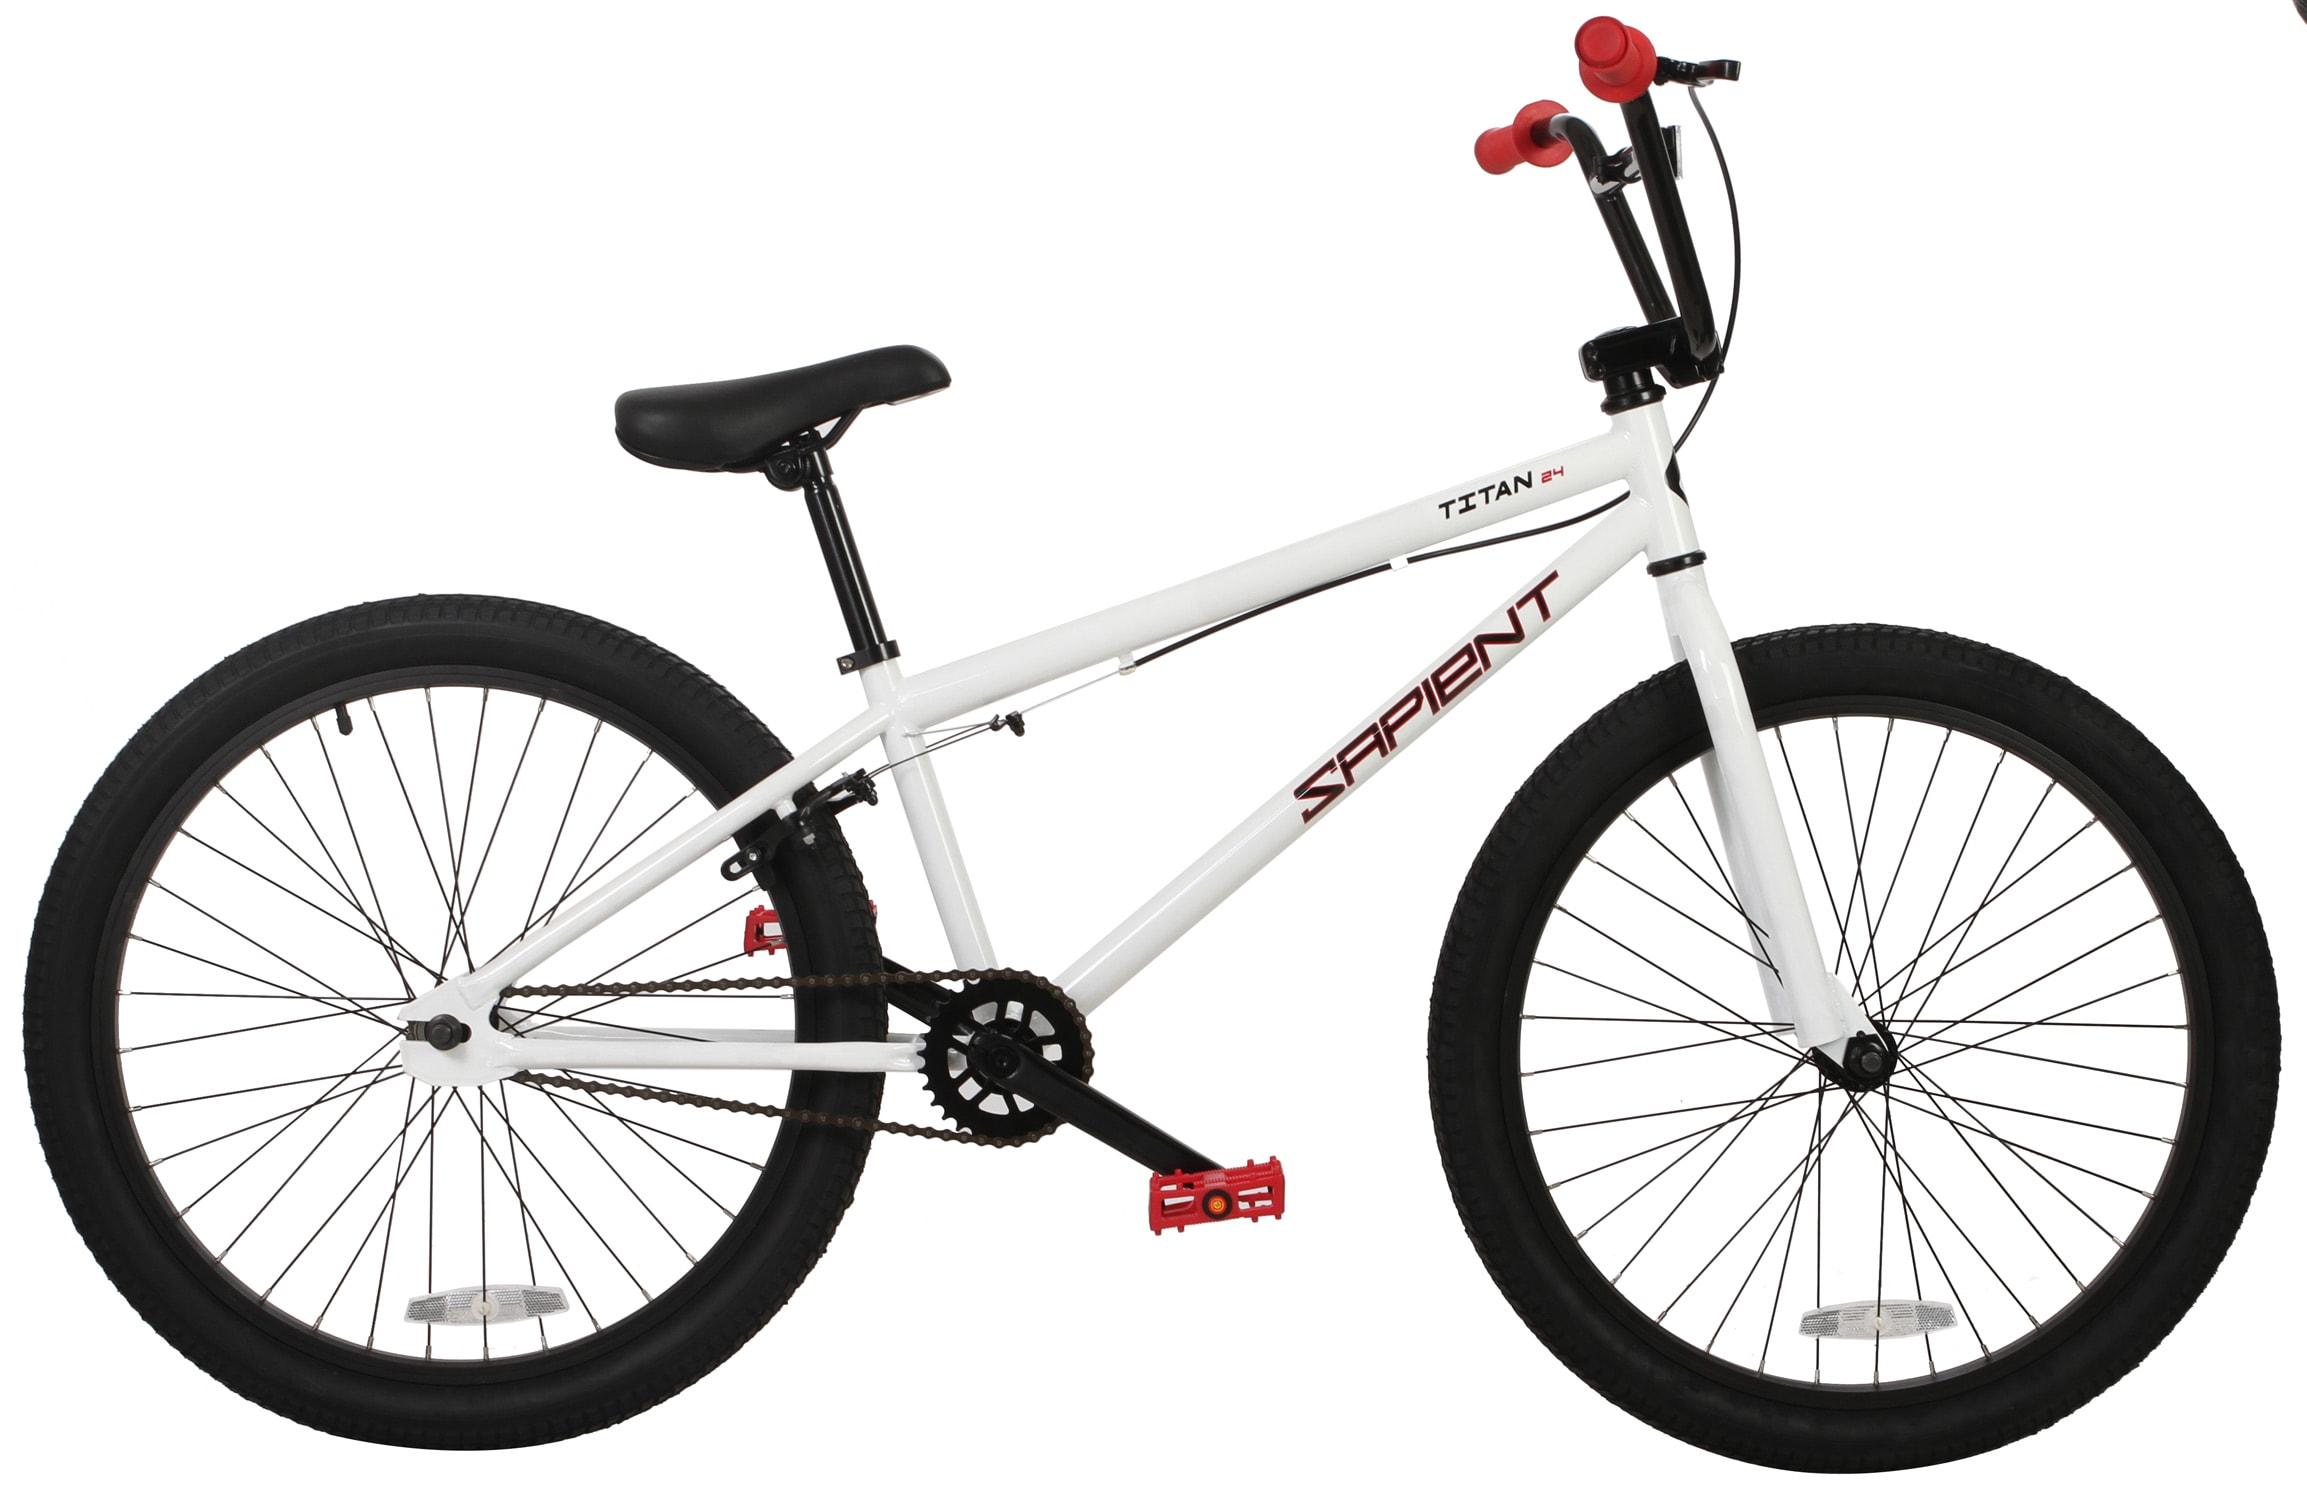 "On Sale Sapient Titan BMX Bike 24"" Up To 45% Off"